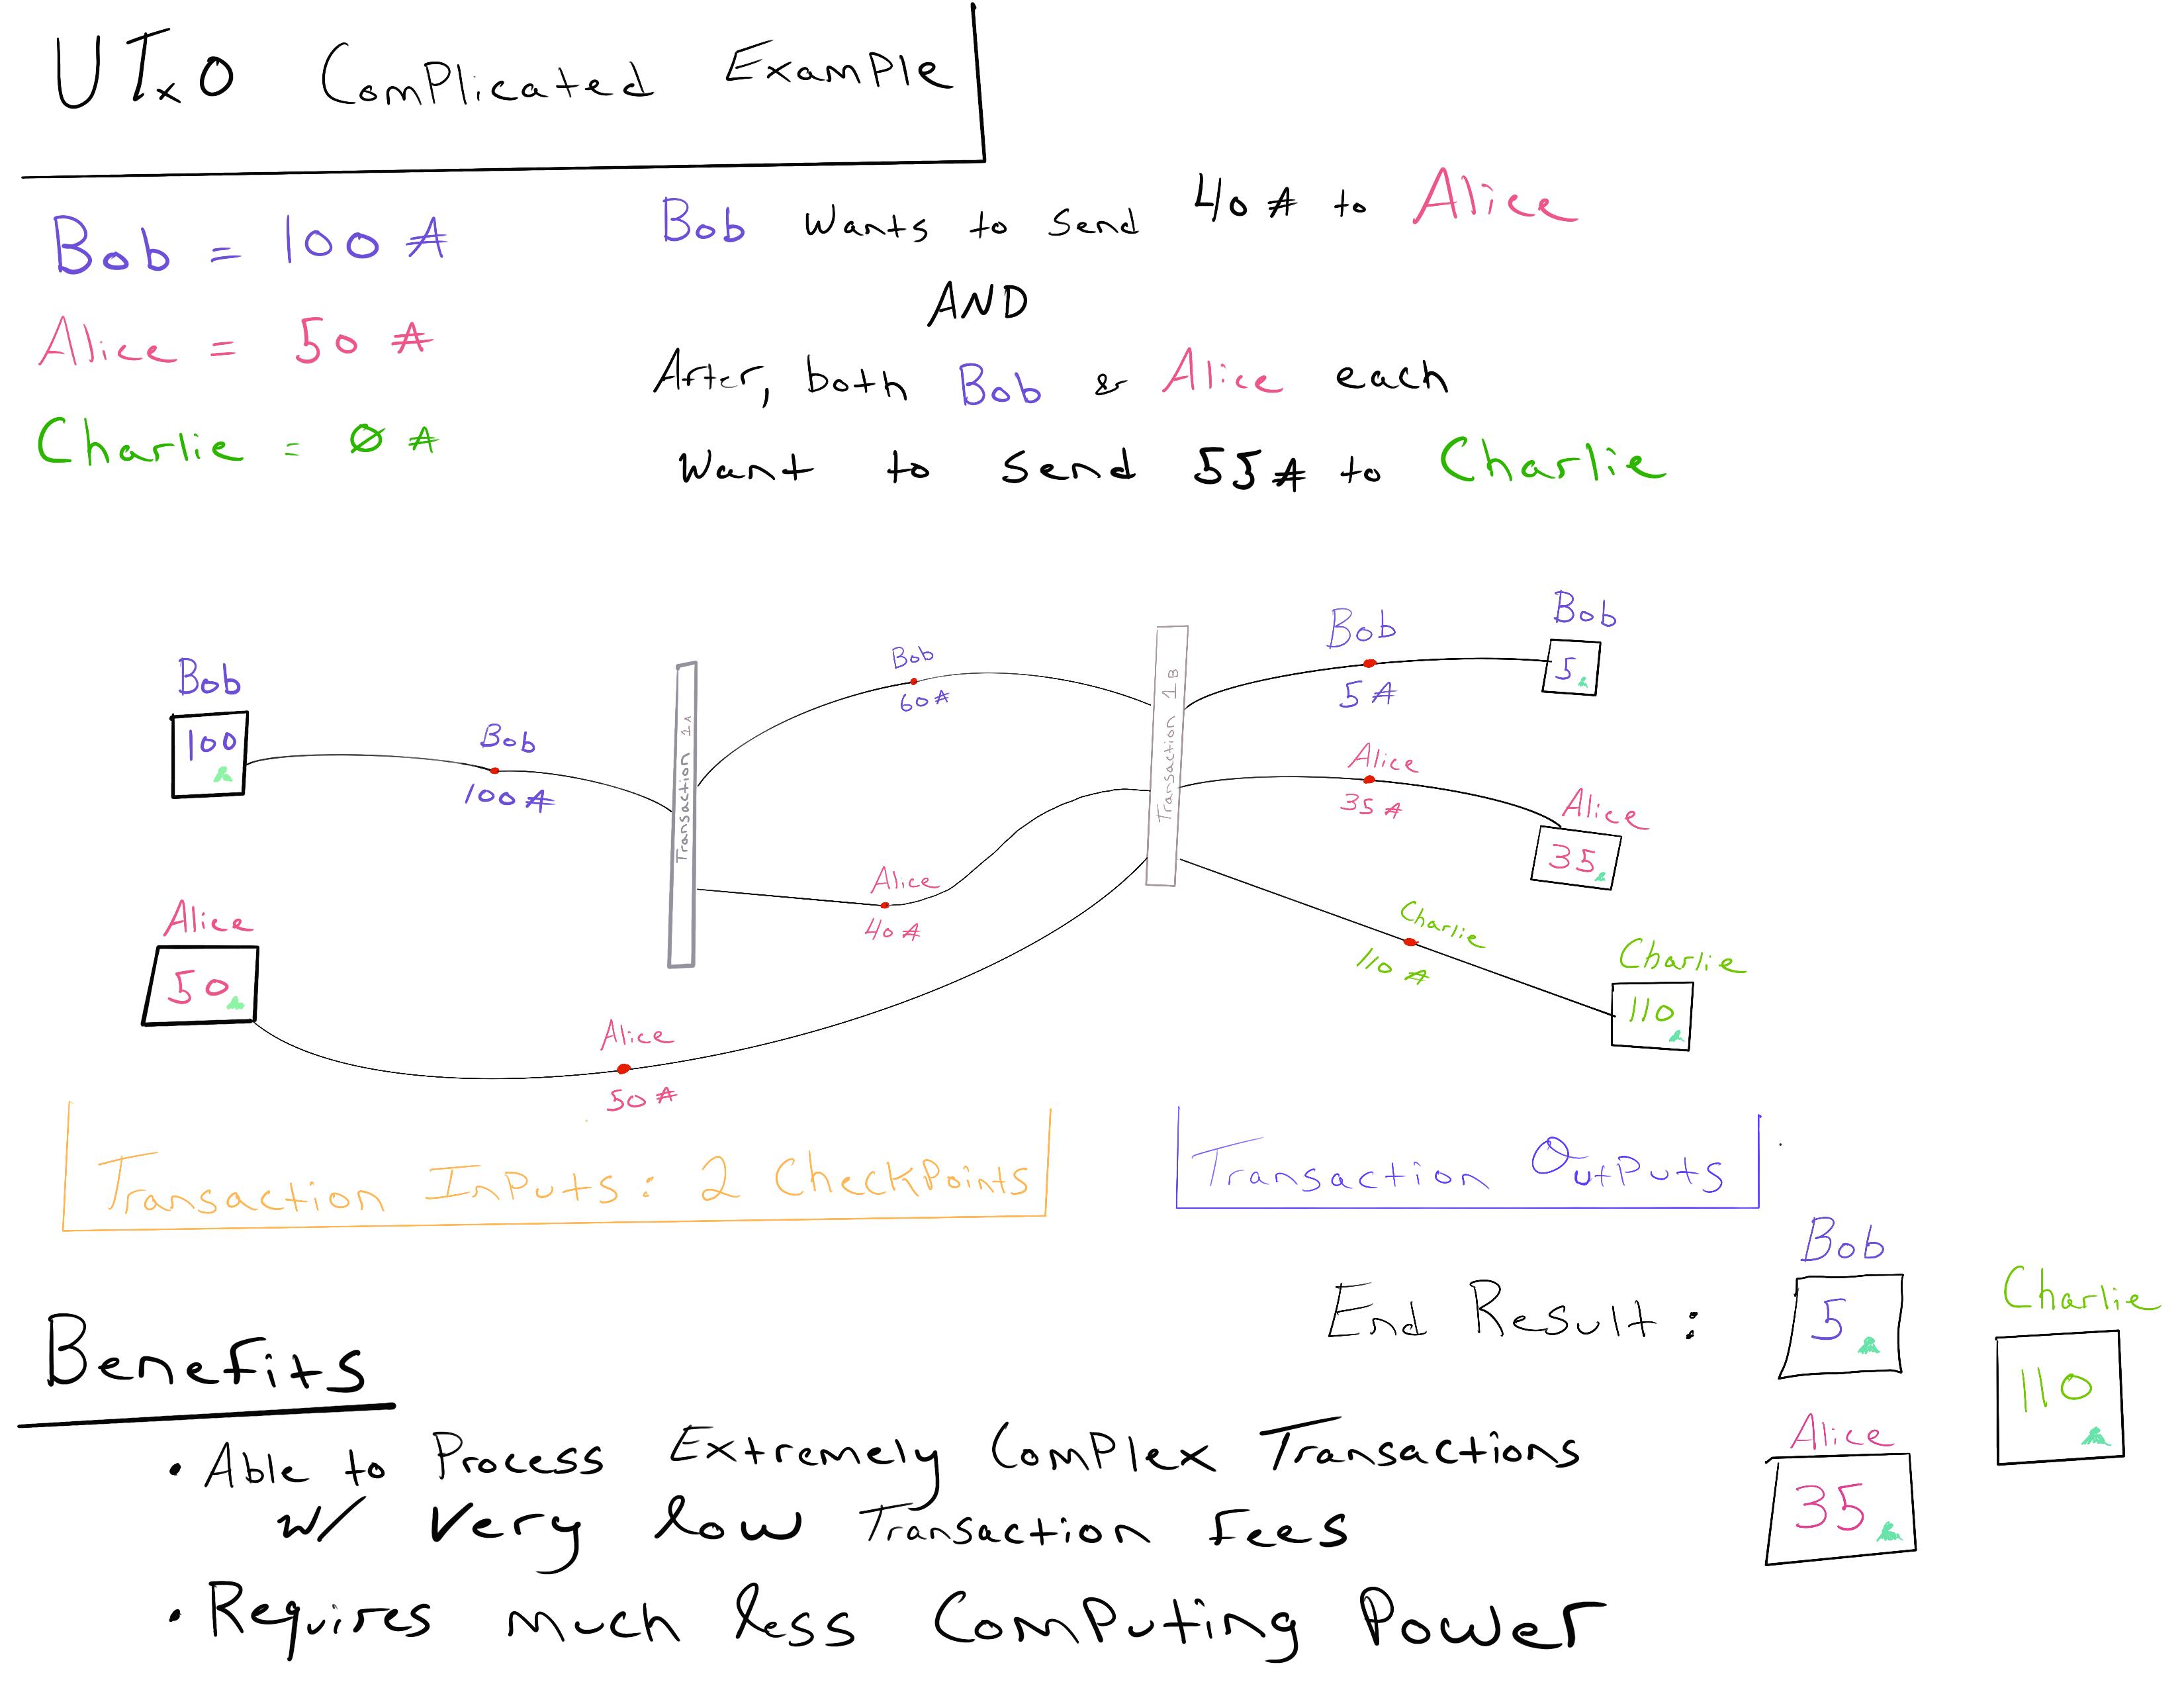 UTXO_Complicated